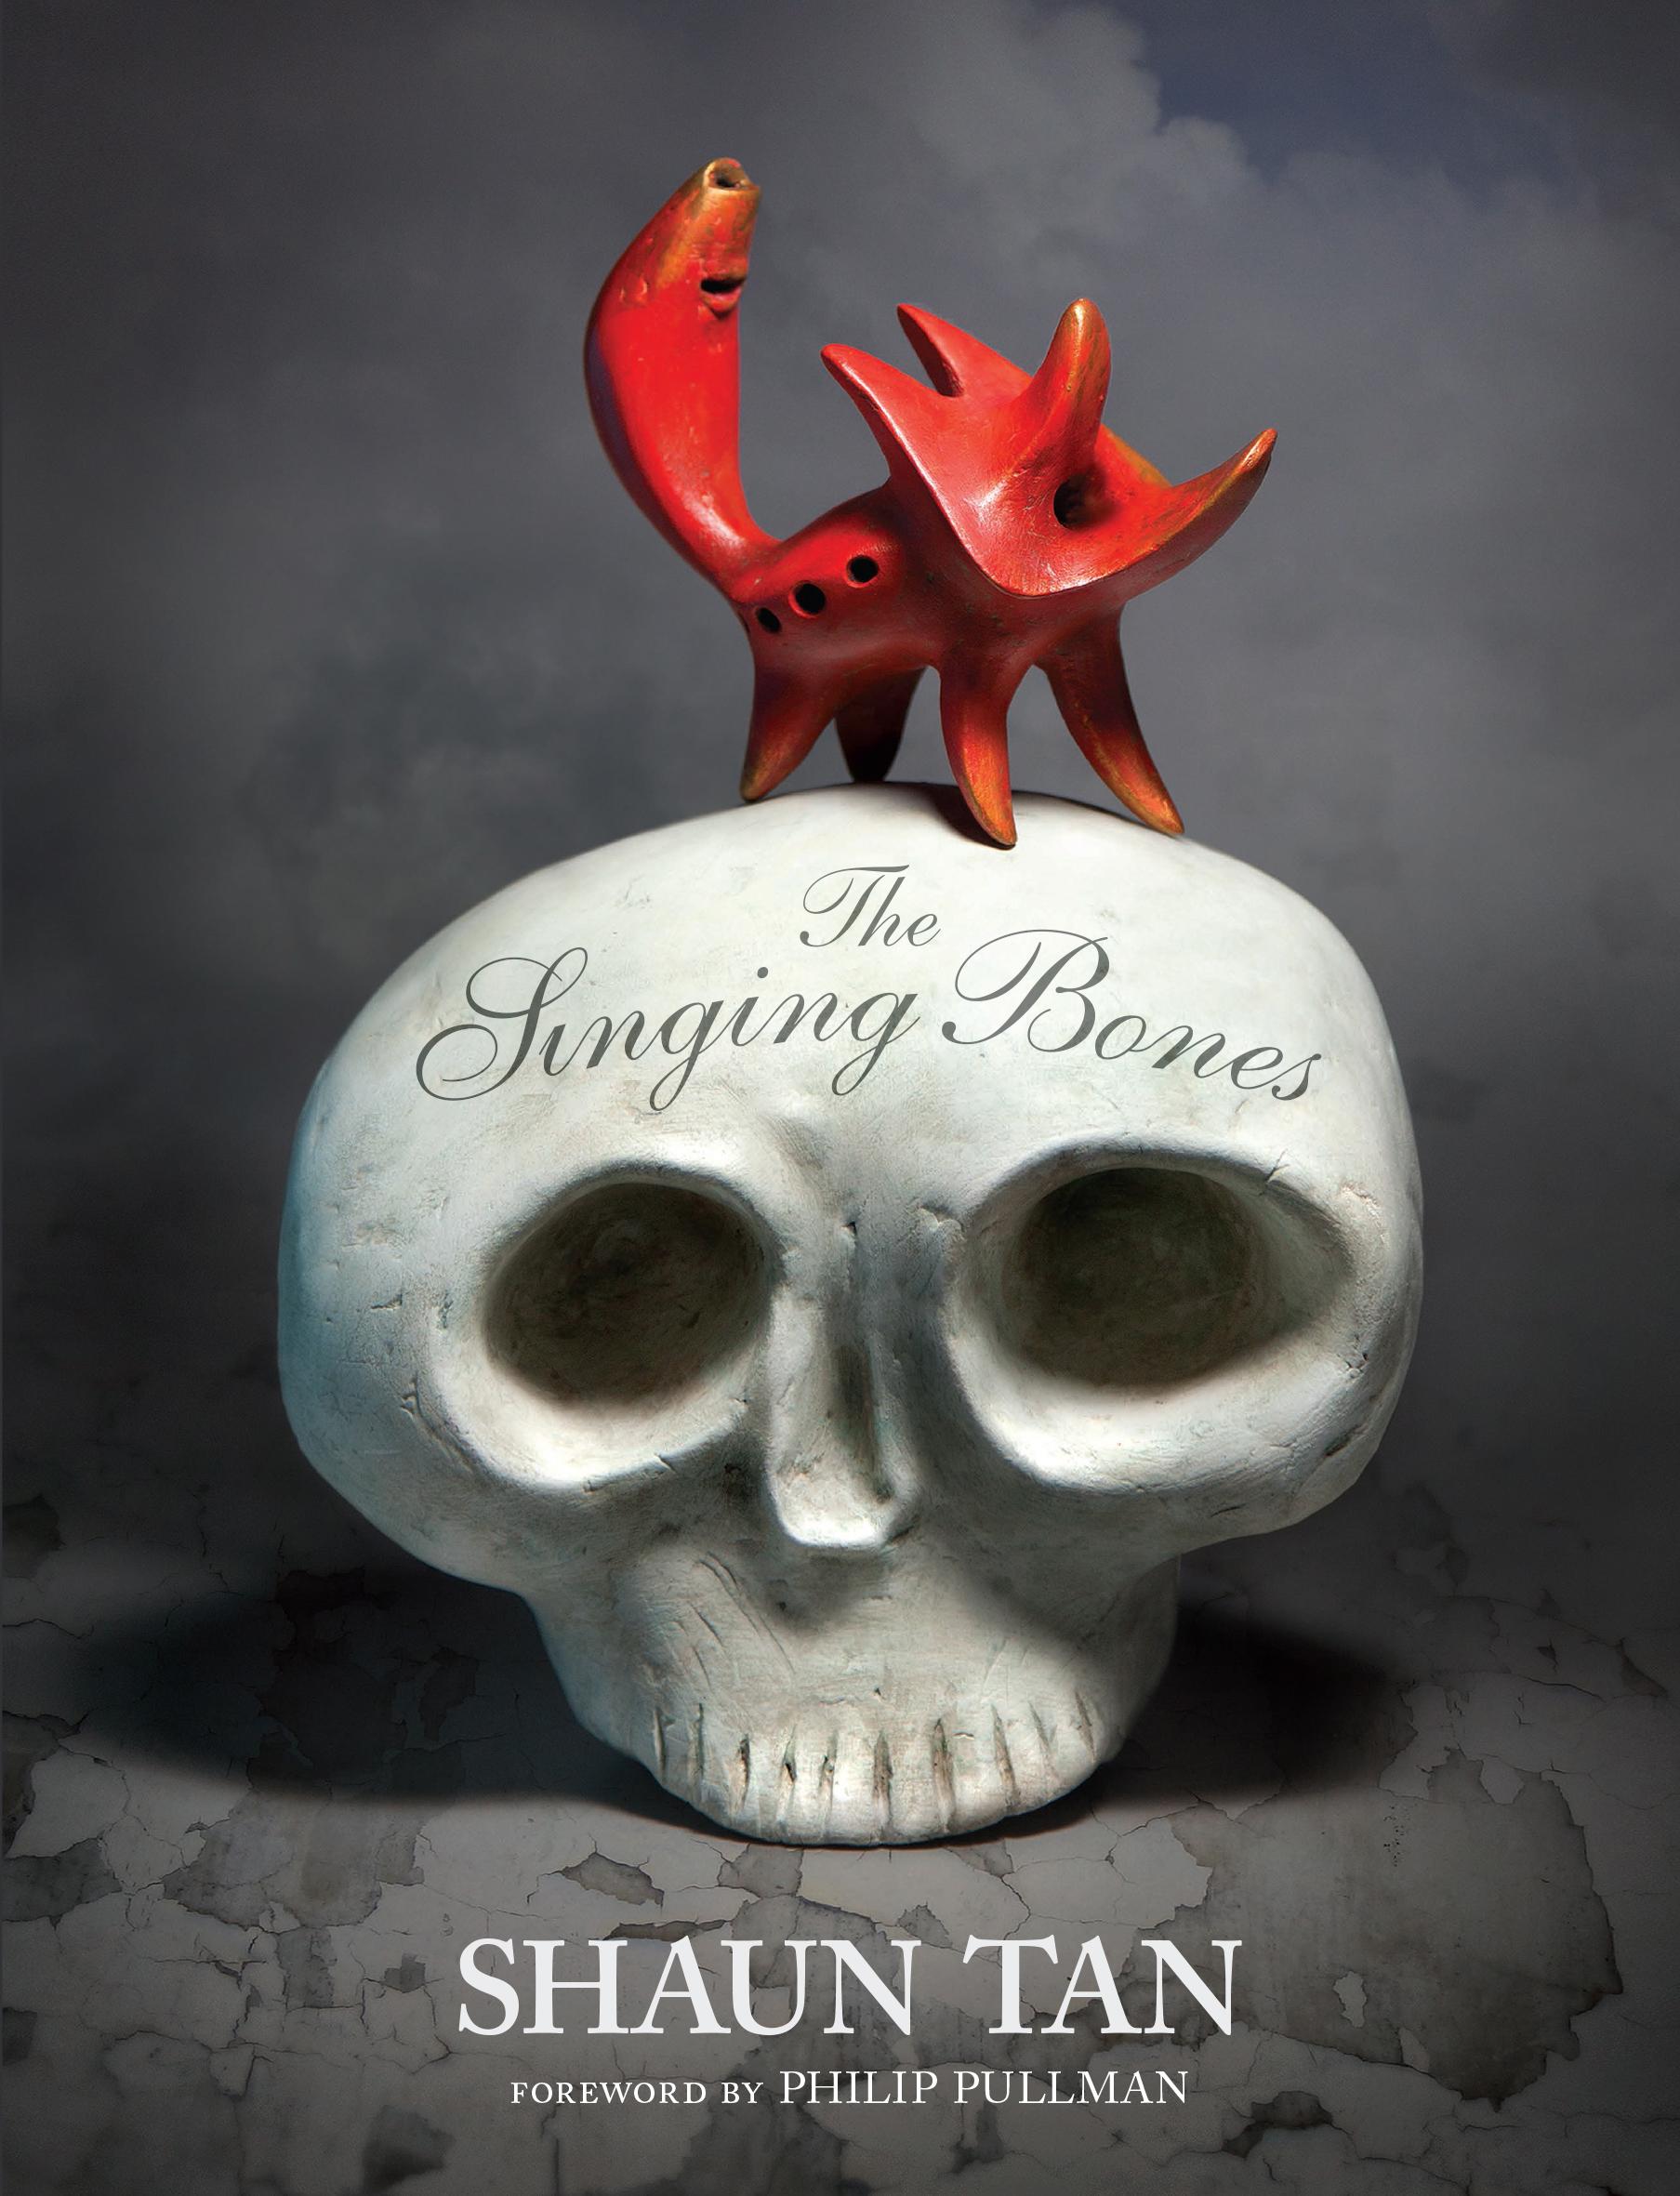 Image result for shaun tan the singing bones